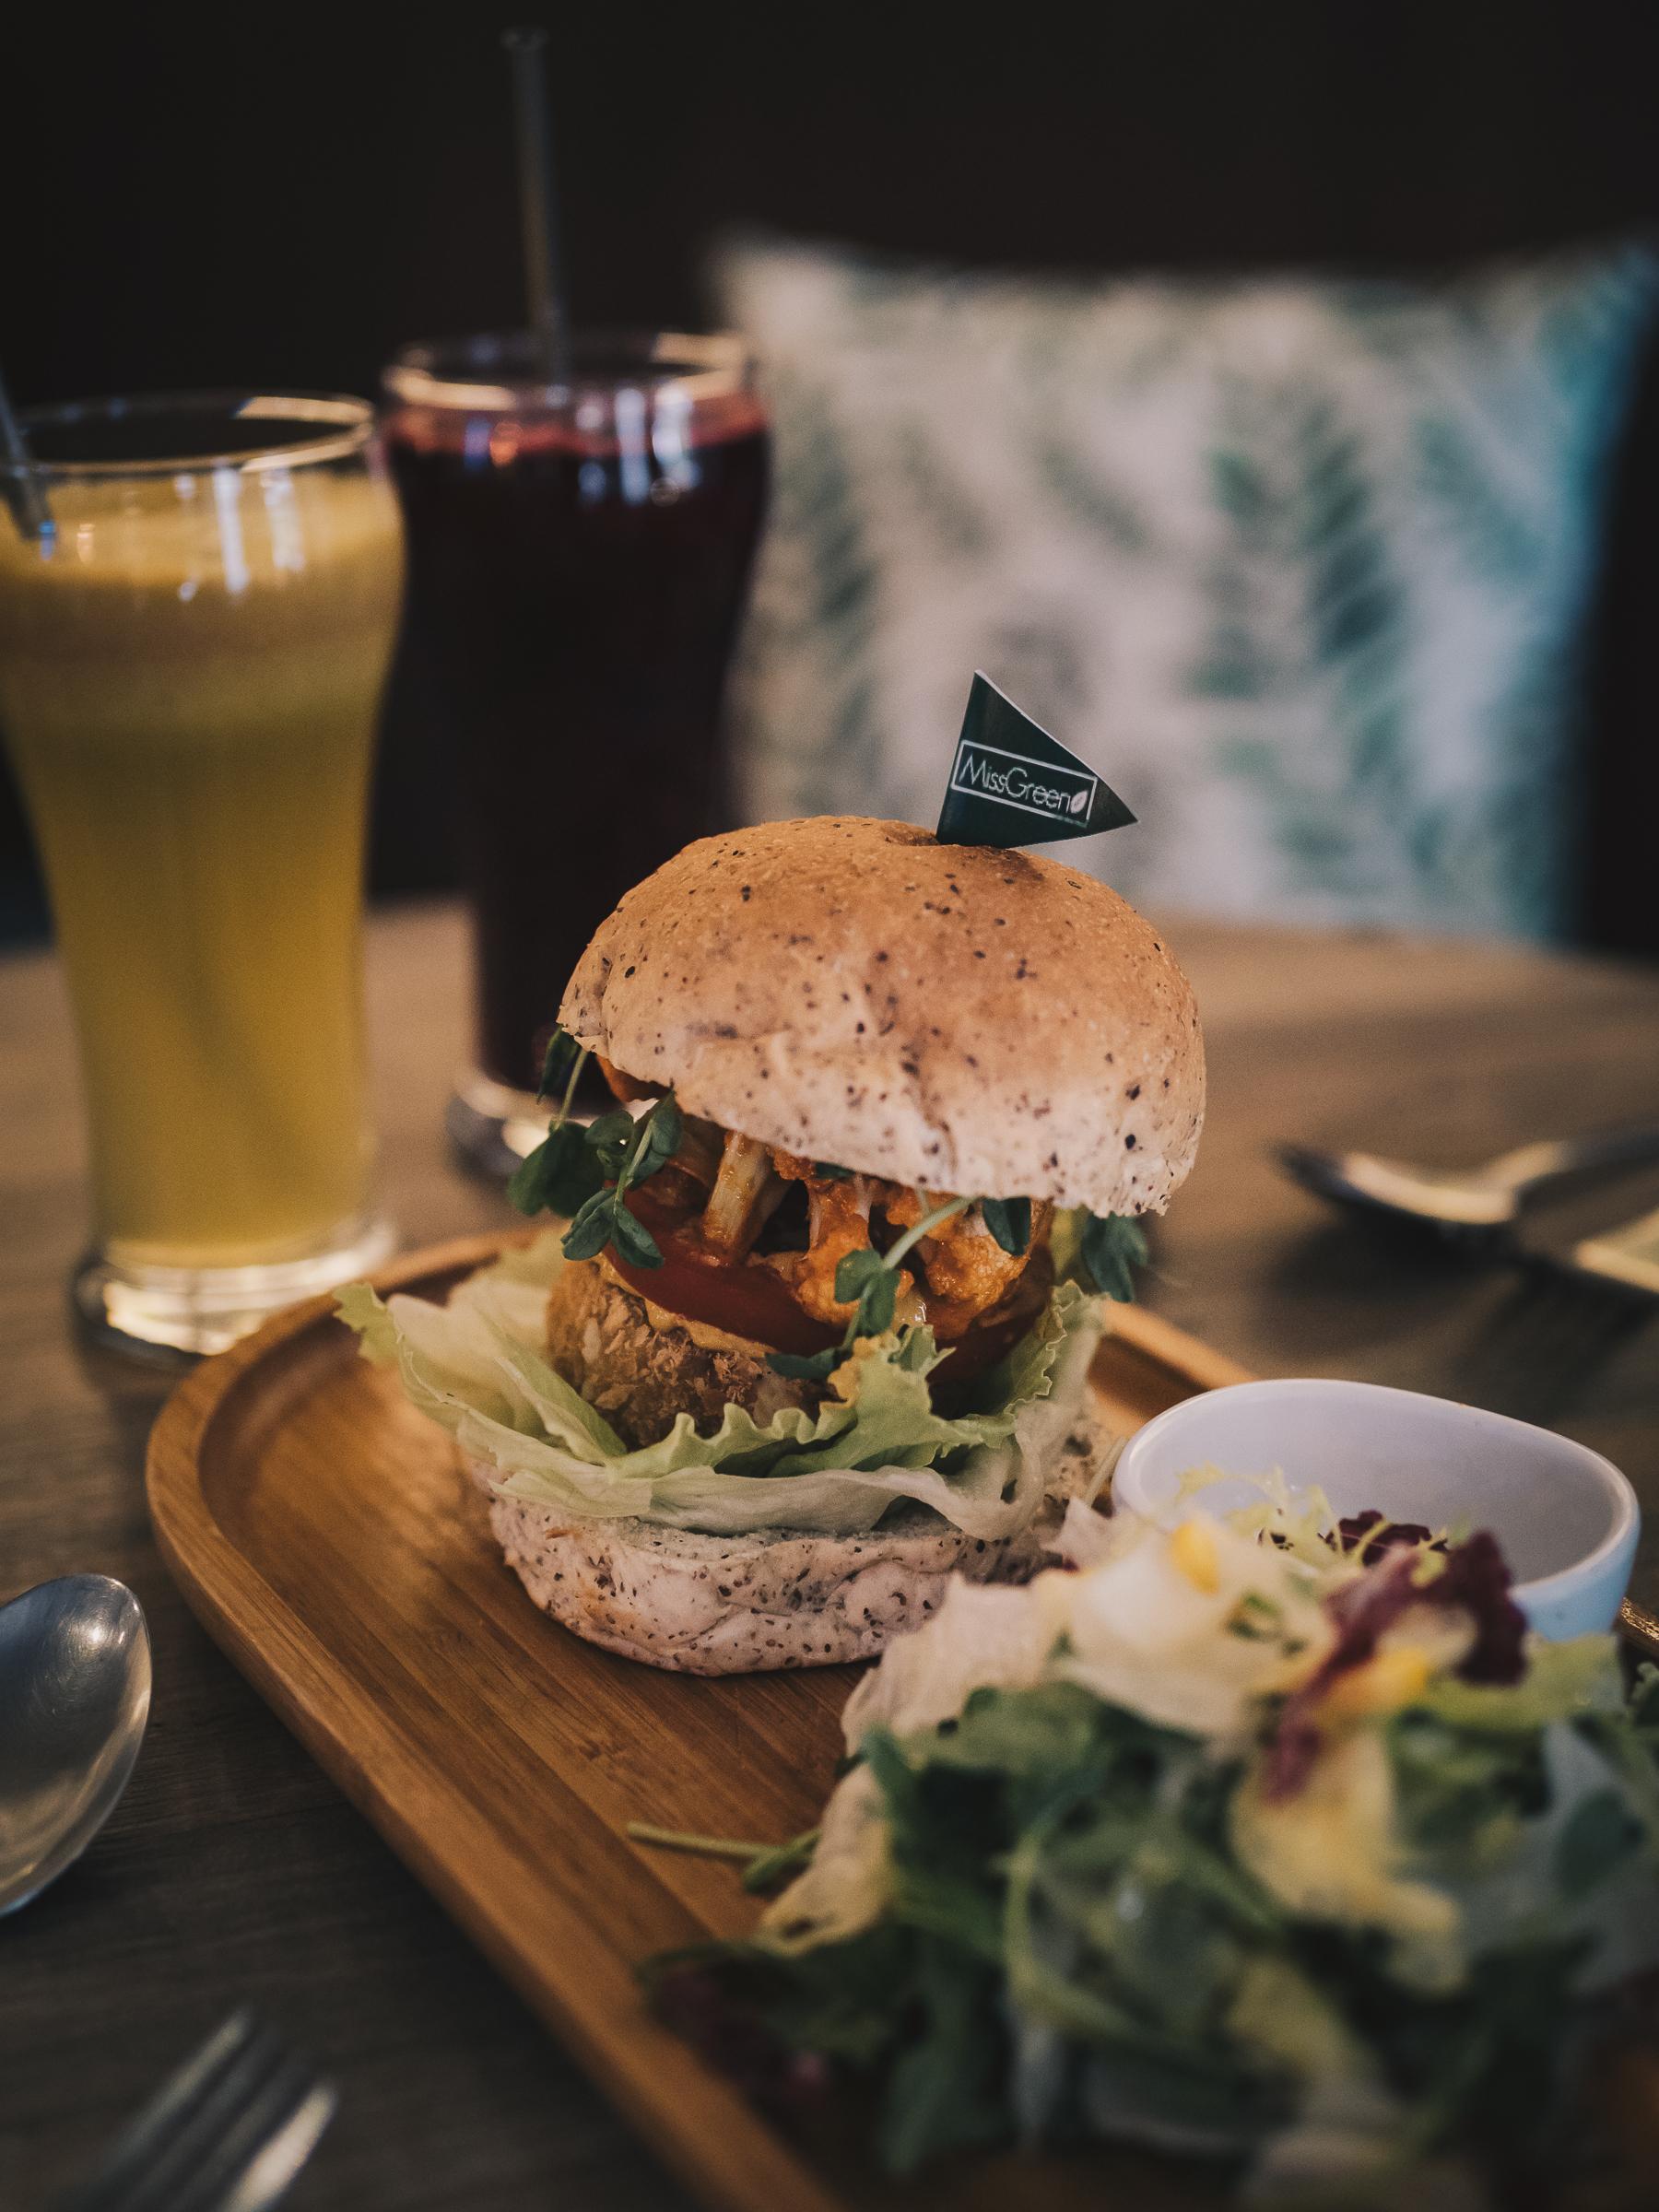 Falafel Favorite 中東香料漢堡|附有沙拉